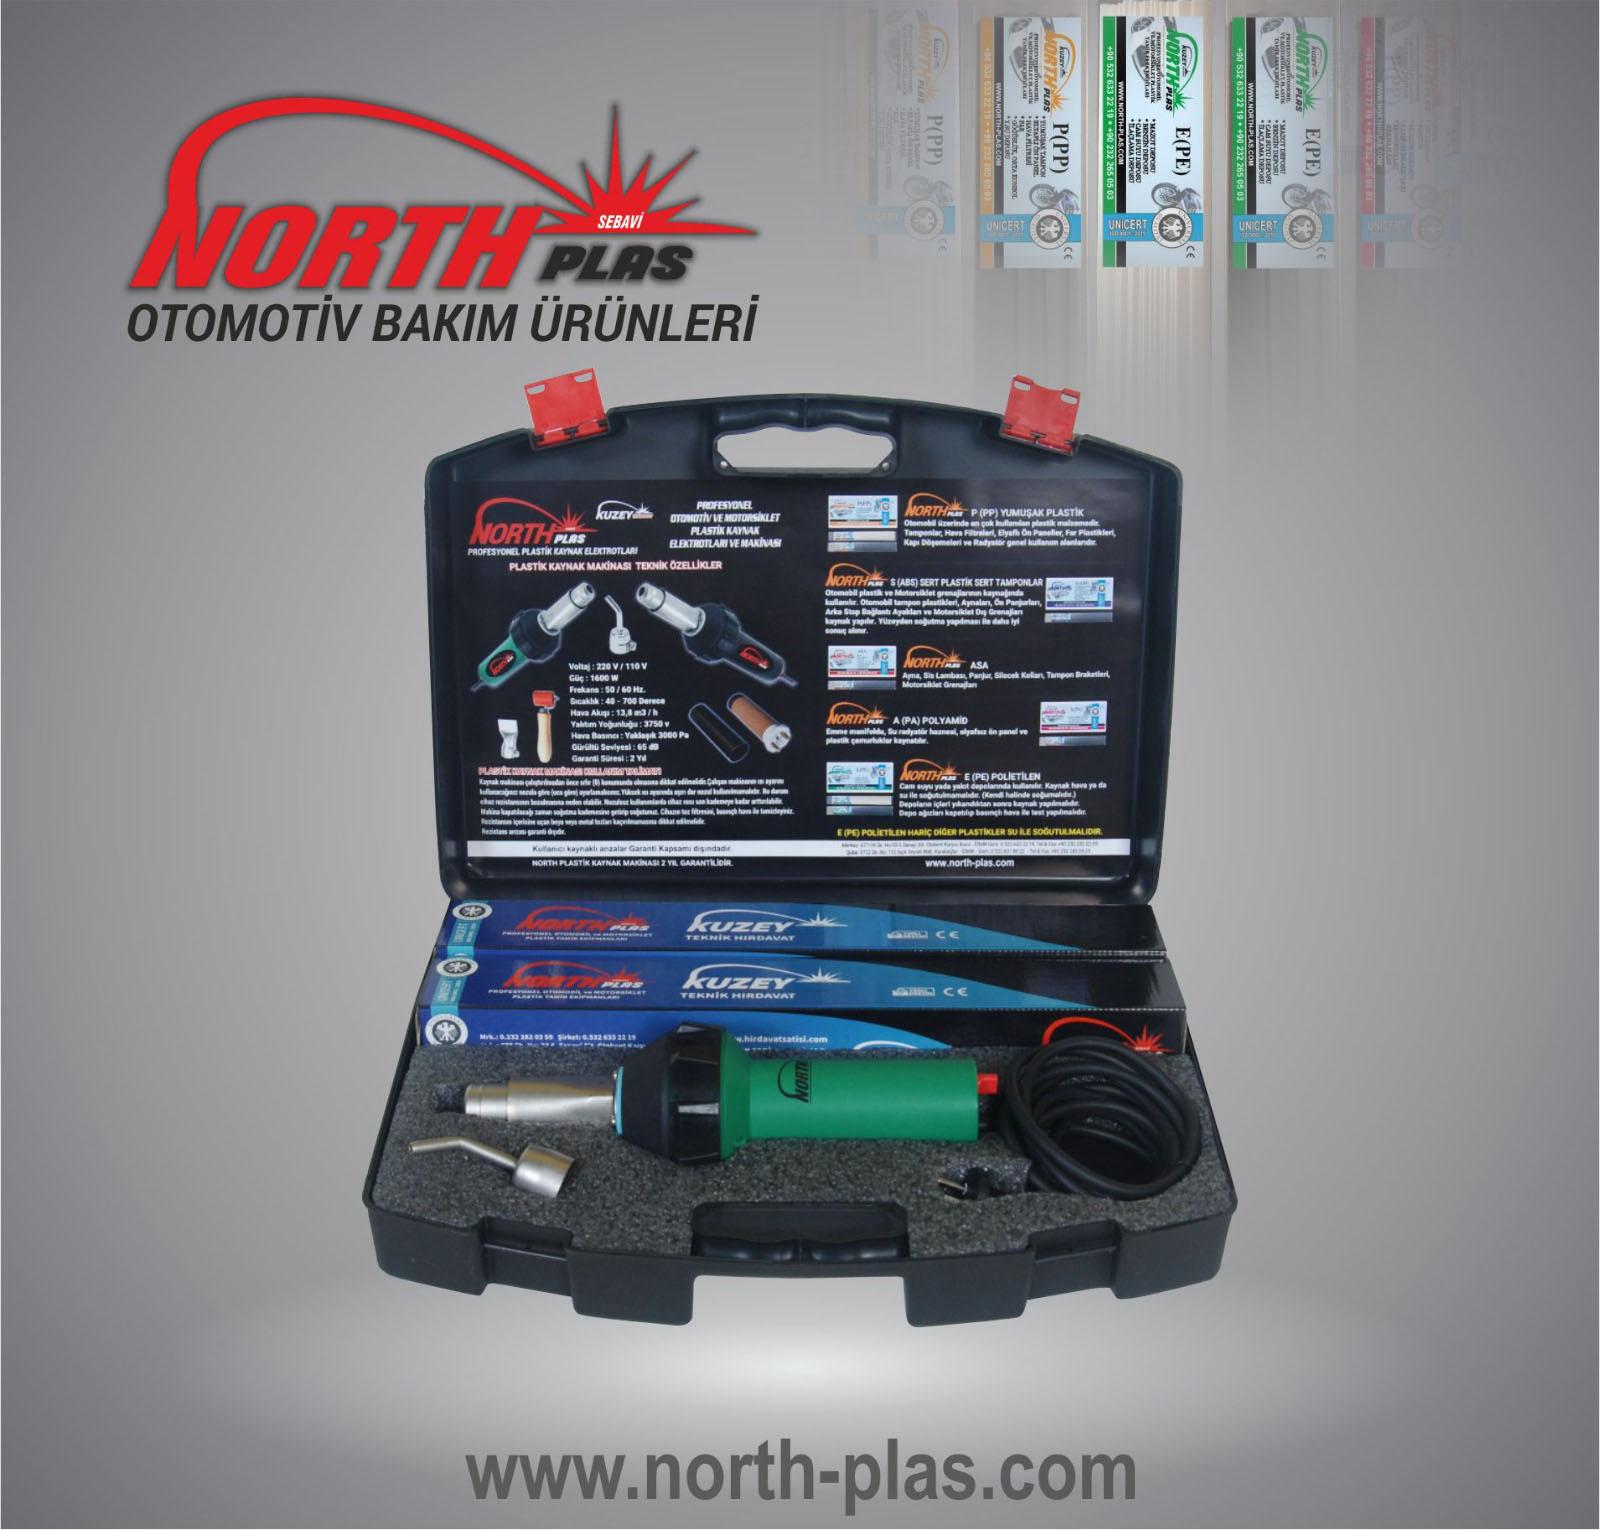 North Plas Plastik Kaynak Makinası seti